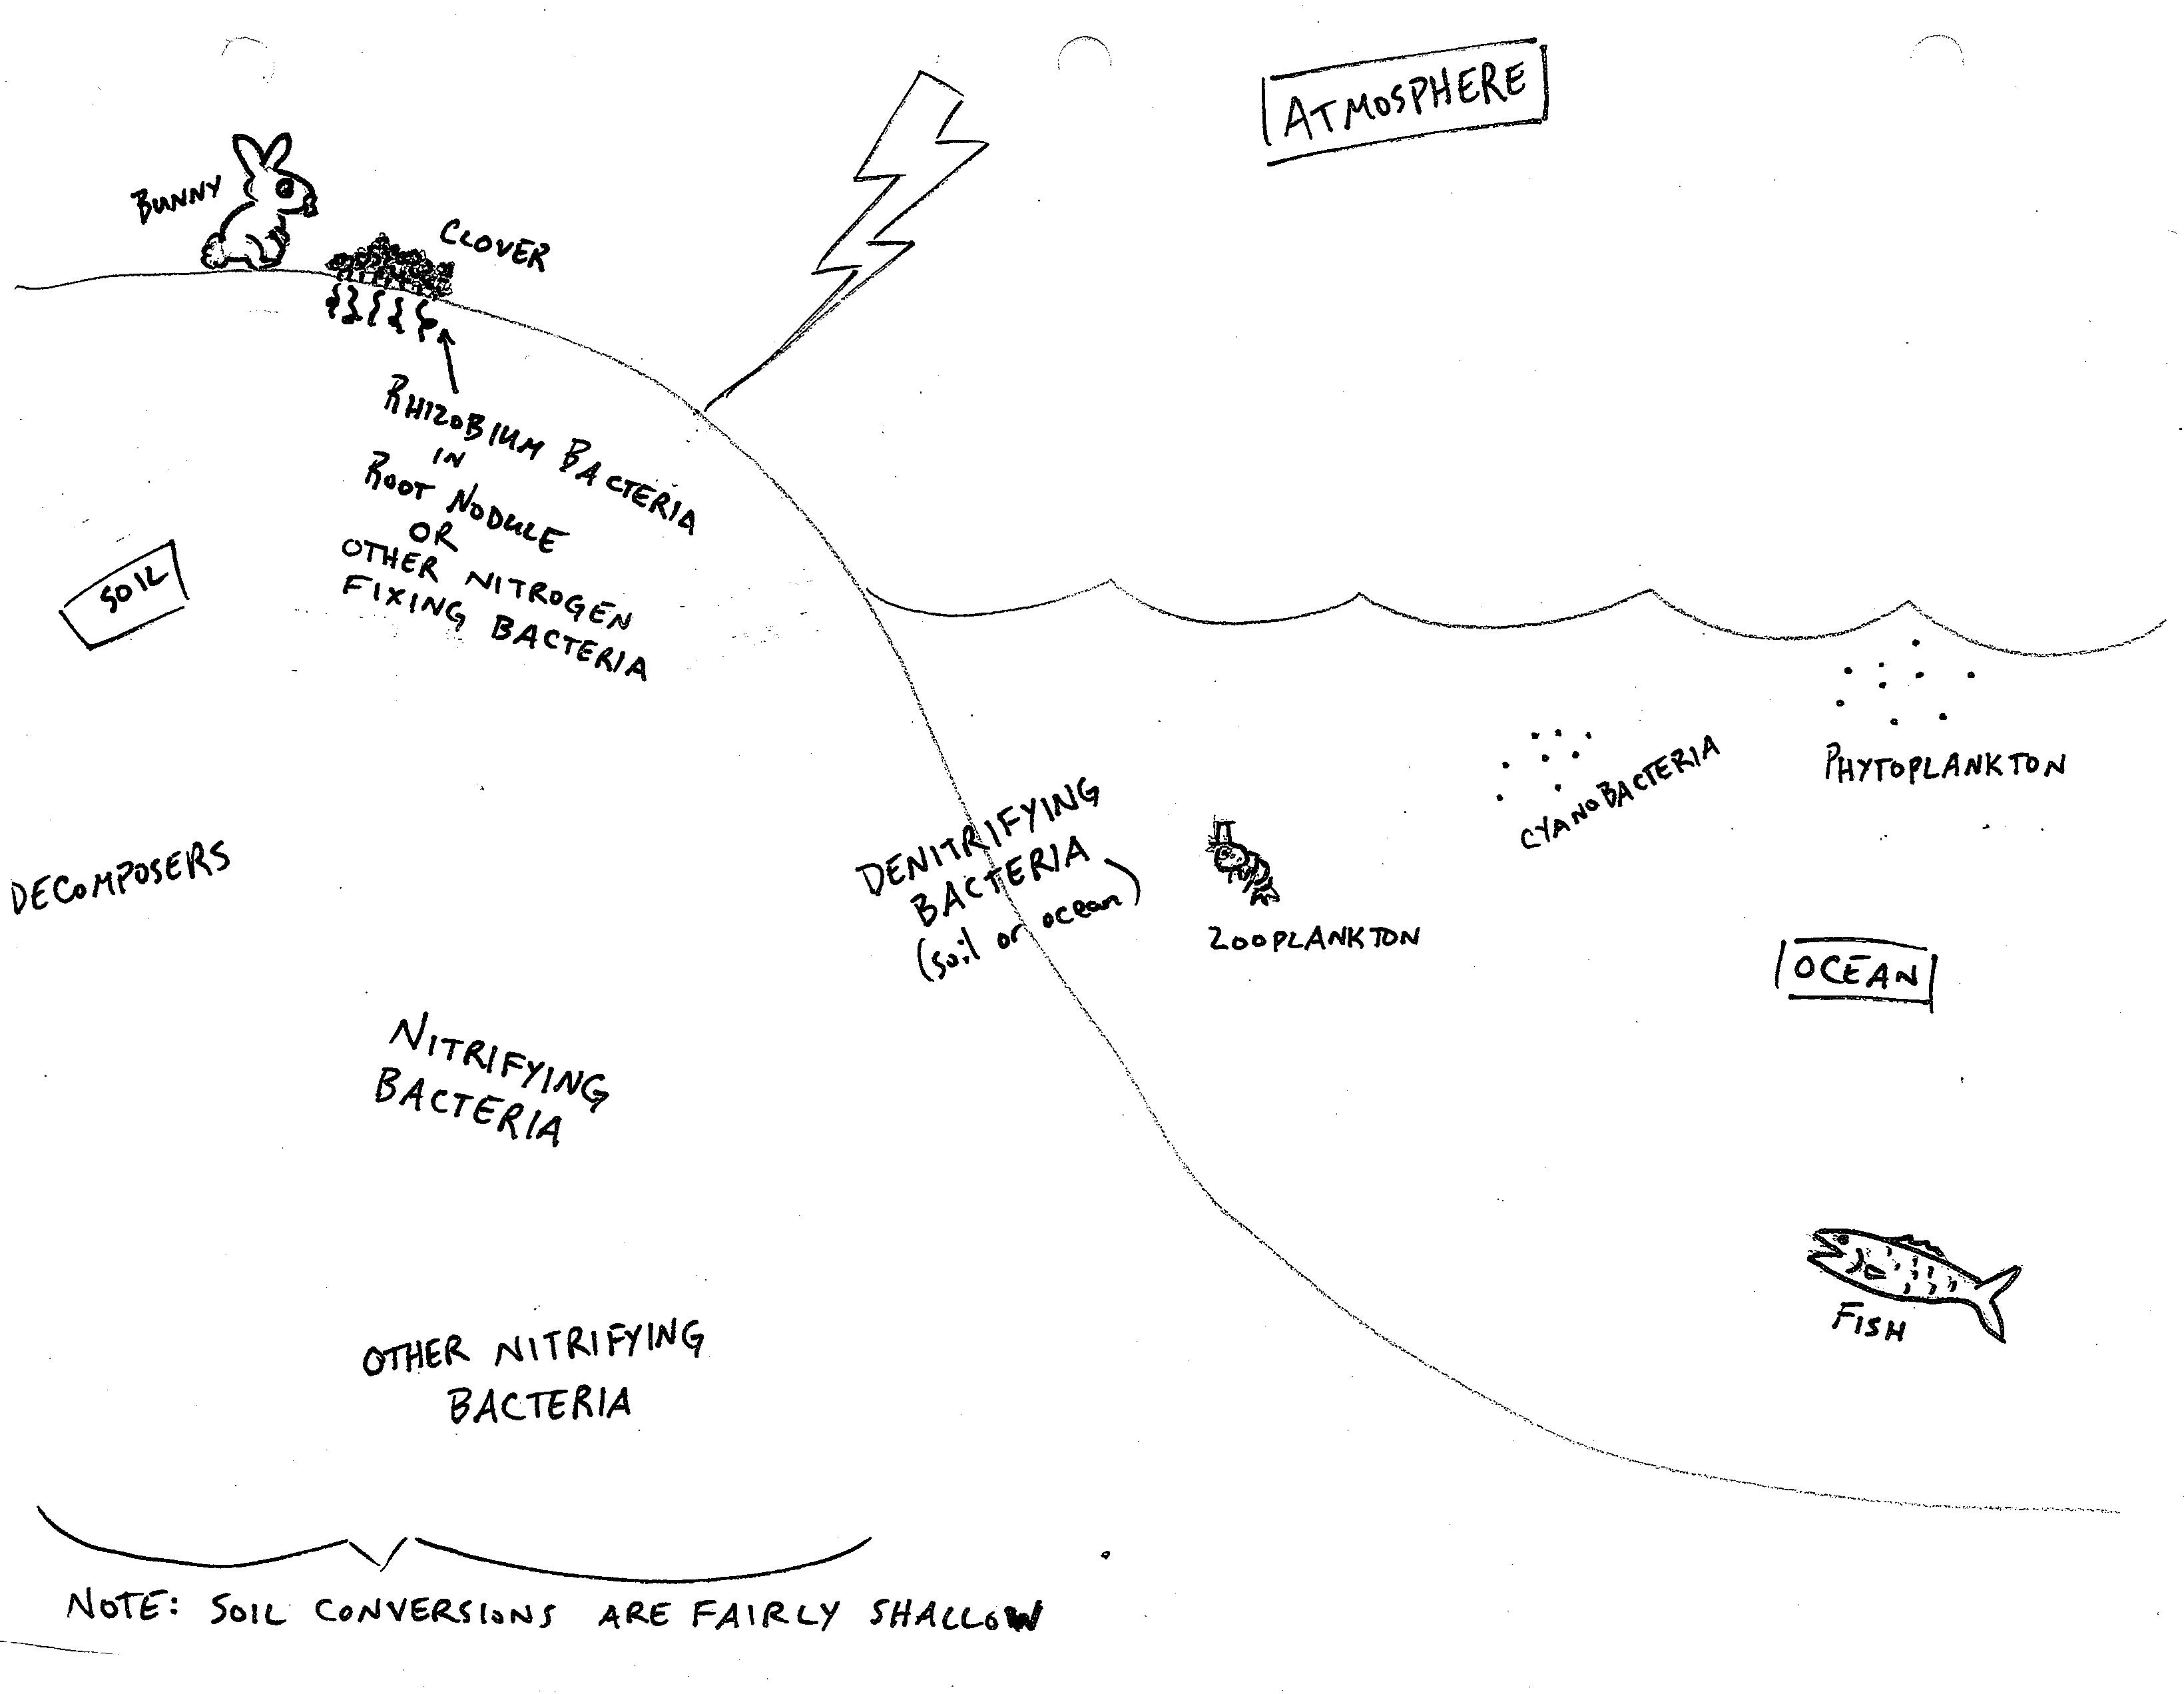 Carbon Cycle Diagram Worksheet | Collis Charles Unit B Fundamentals Of Ecology